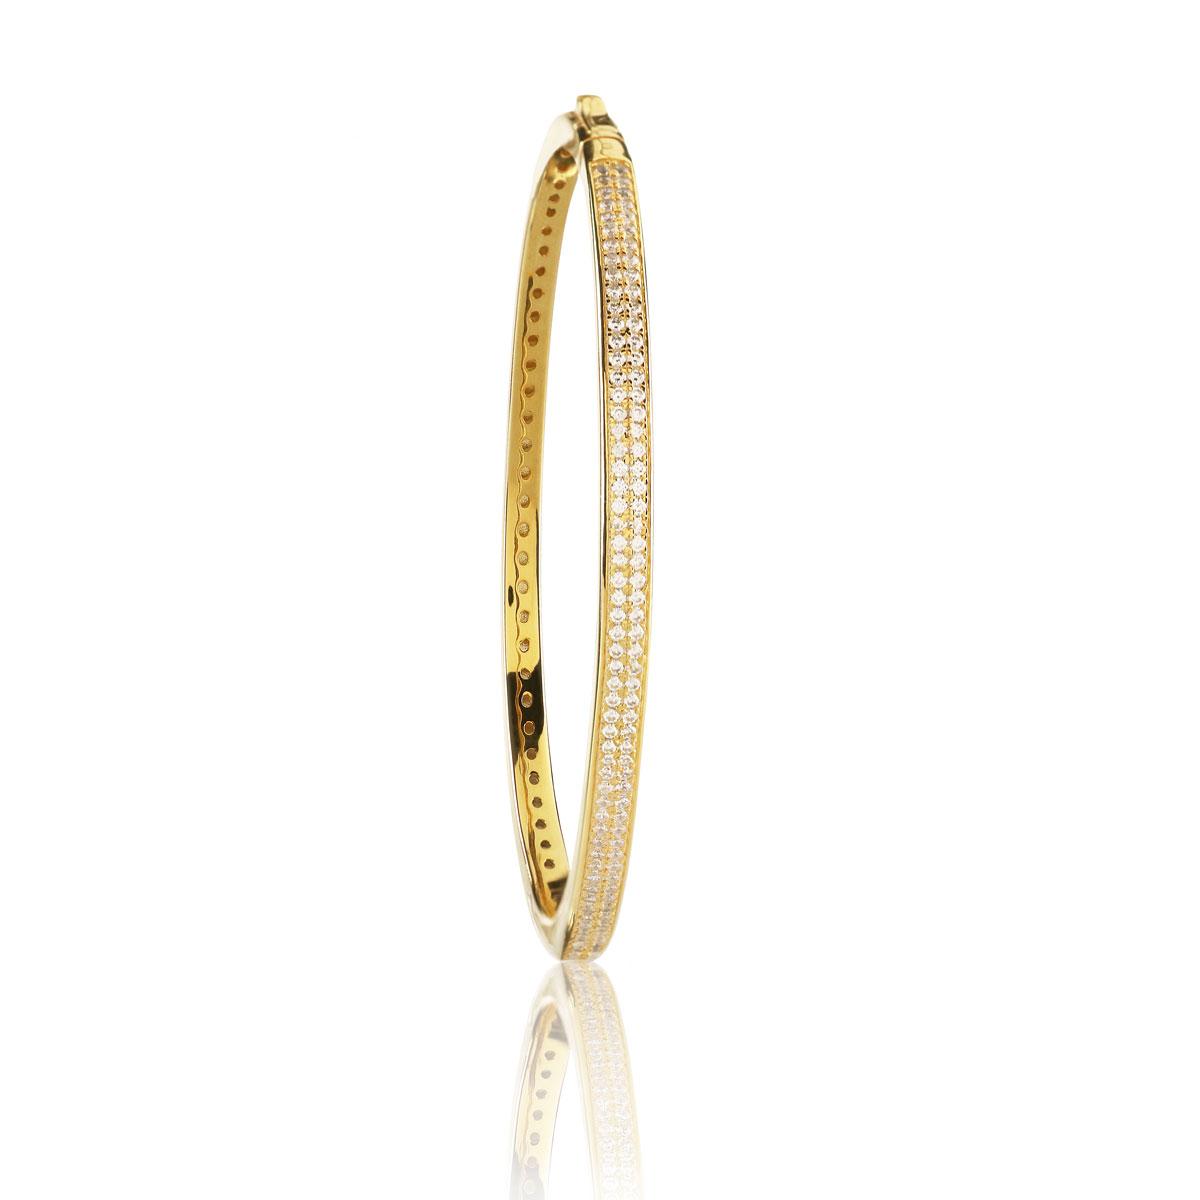 Cashs Ireland, Celeste Gold Double Pave Hinged Bracelet